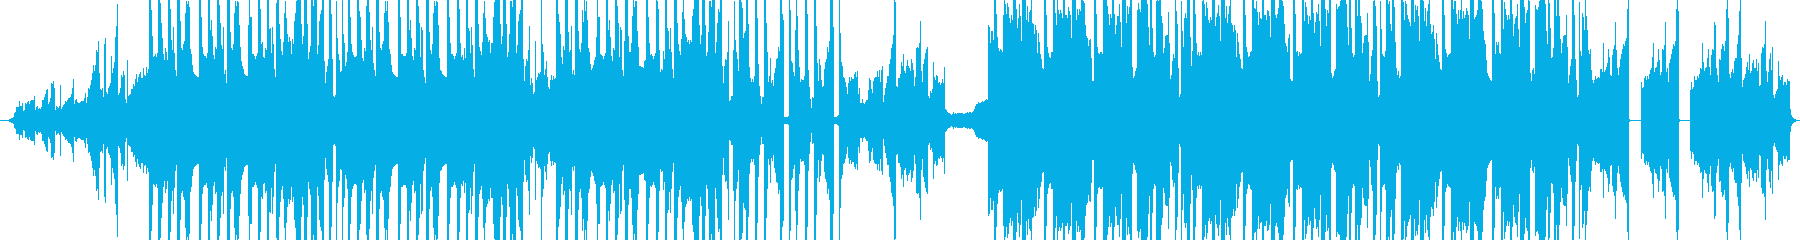 Originの再生済みの波形